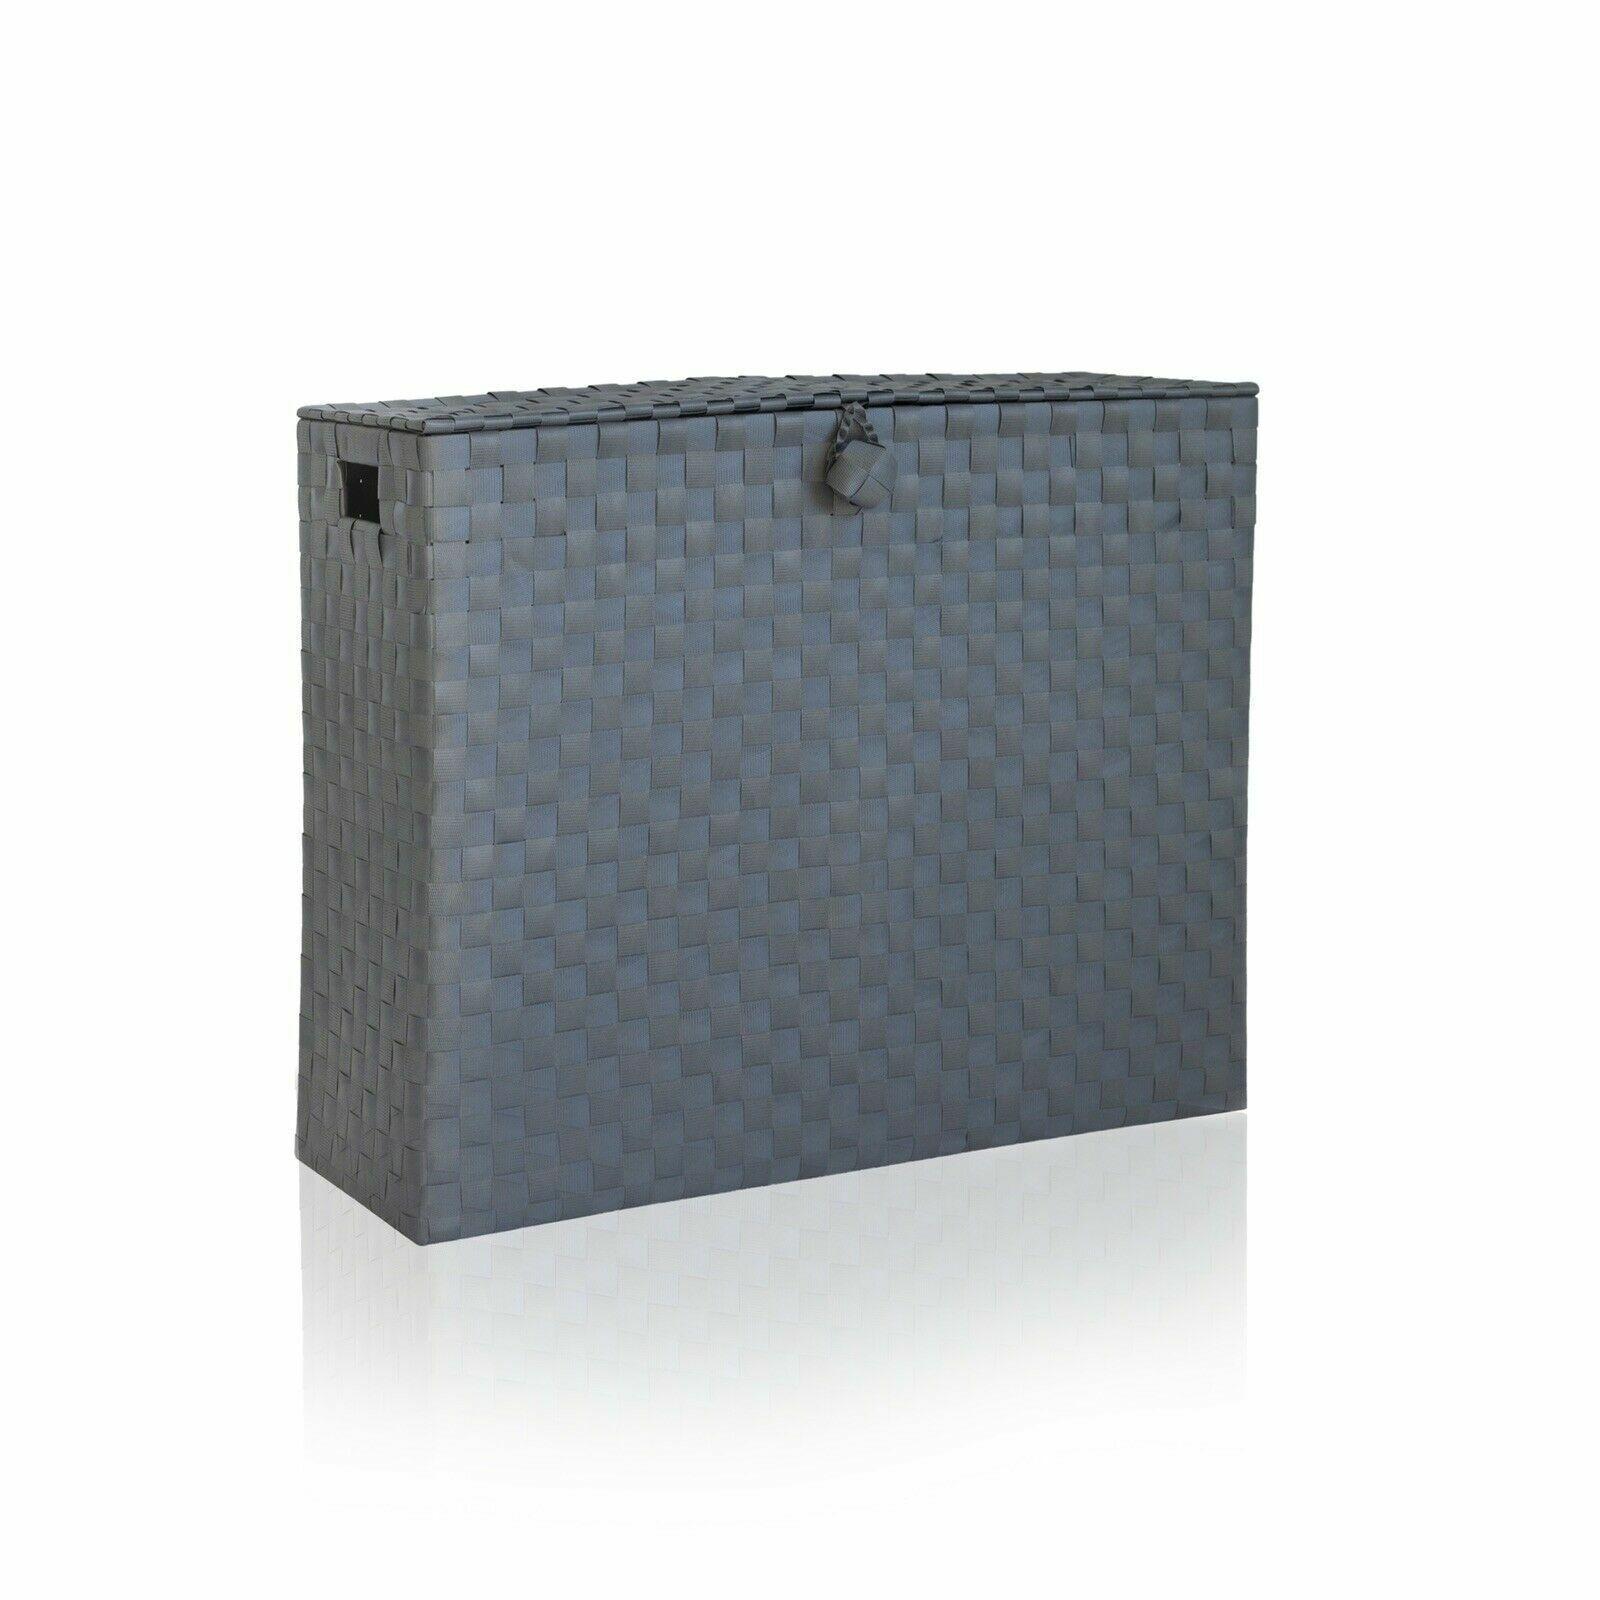 Vencier White/Grey Toilet Roll Holder Bathroom Storage Box With Insert Handle